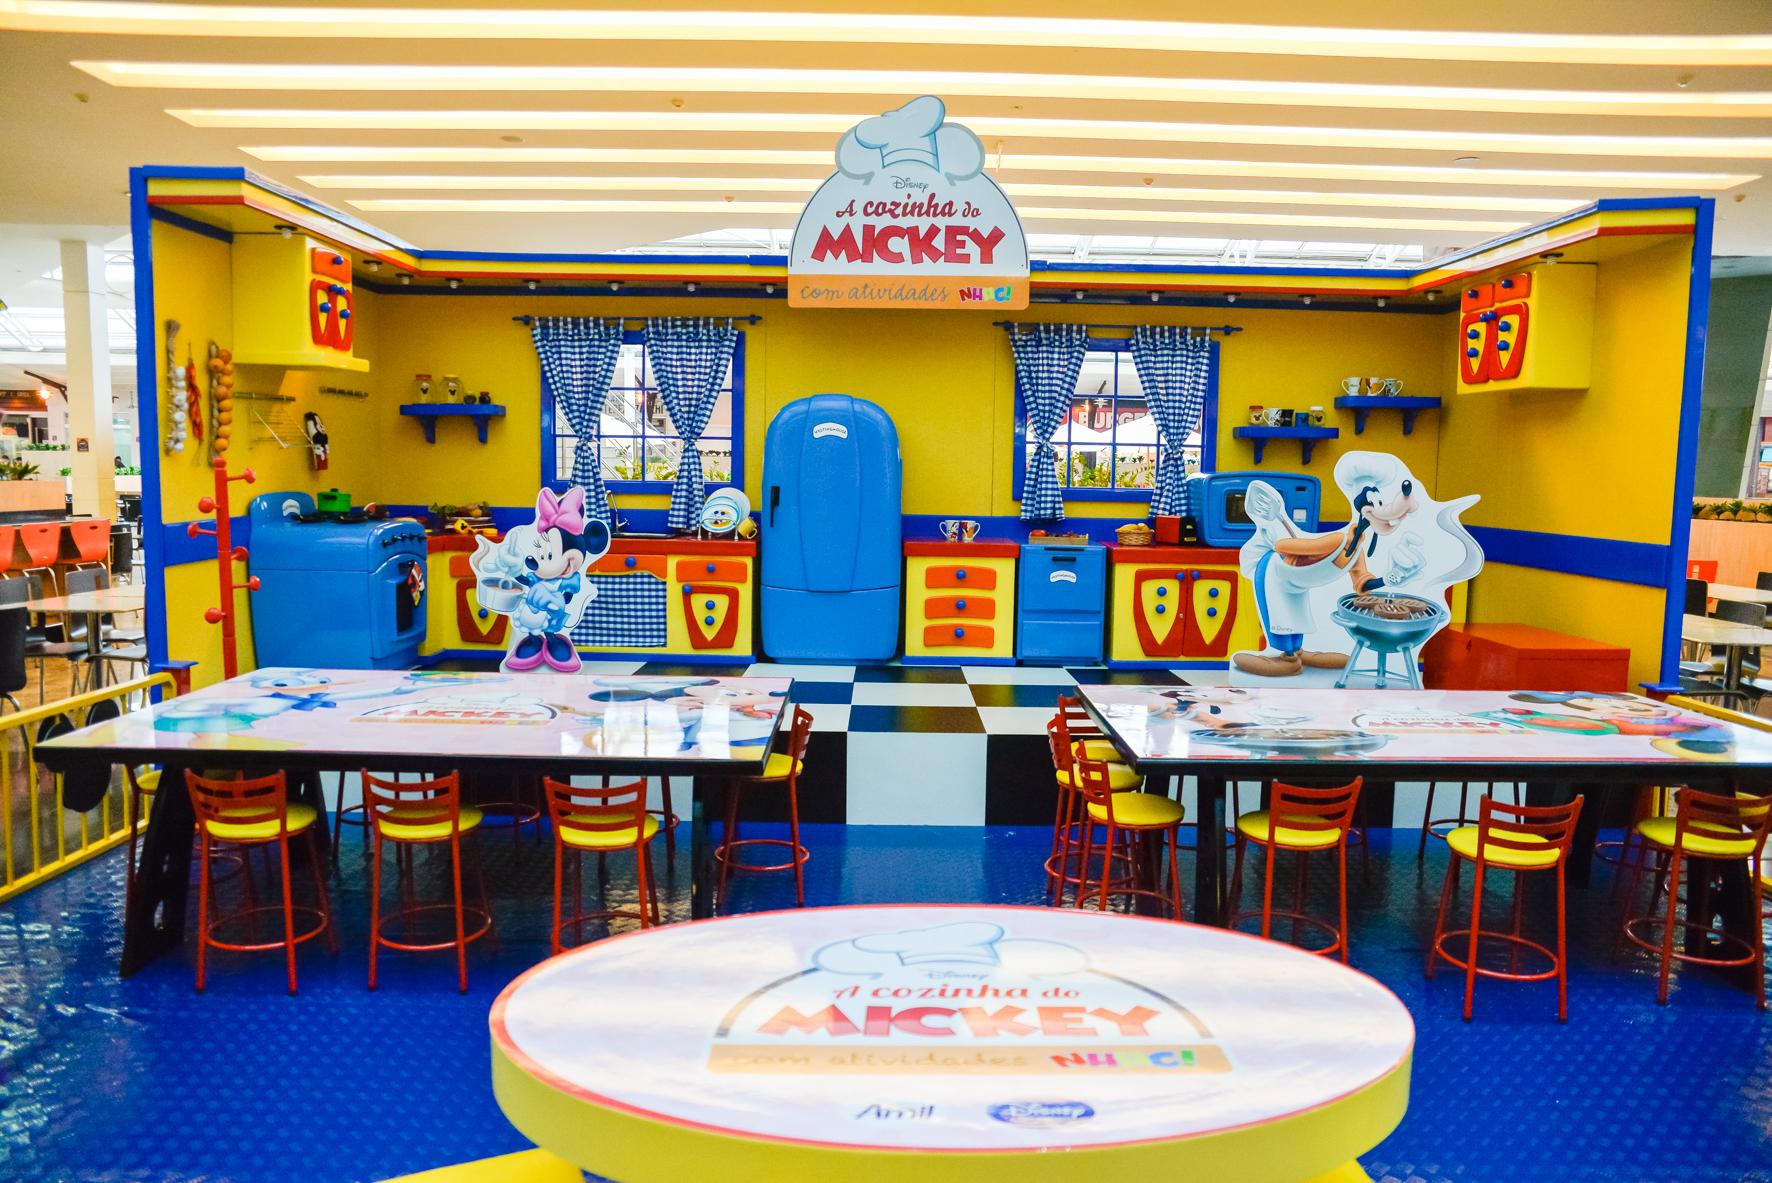 cozinha do mickey